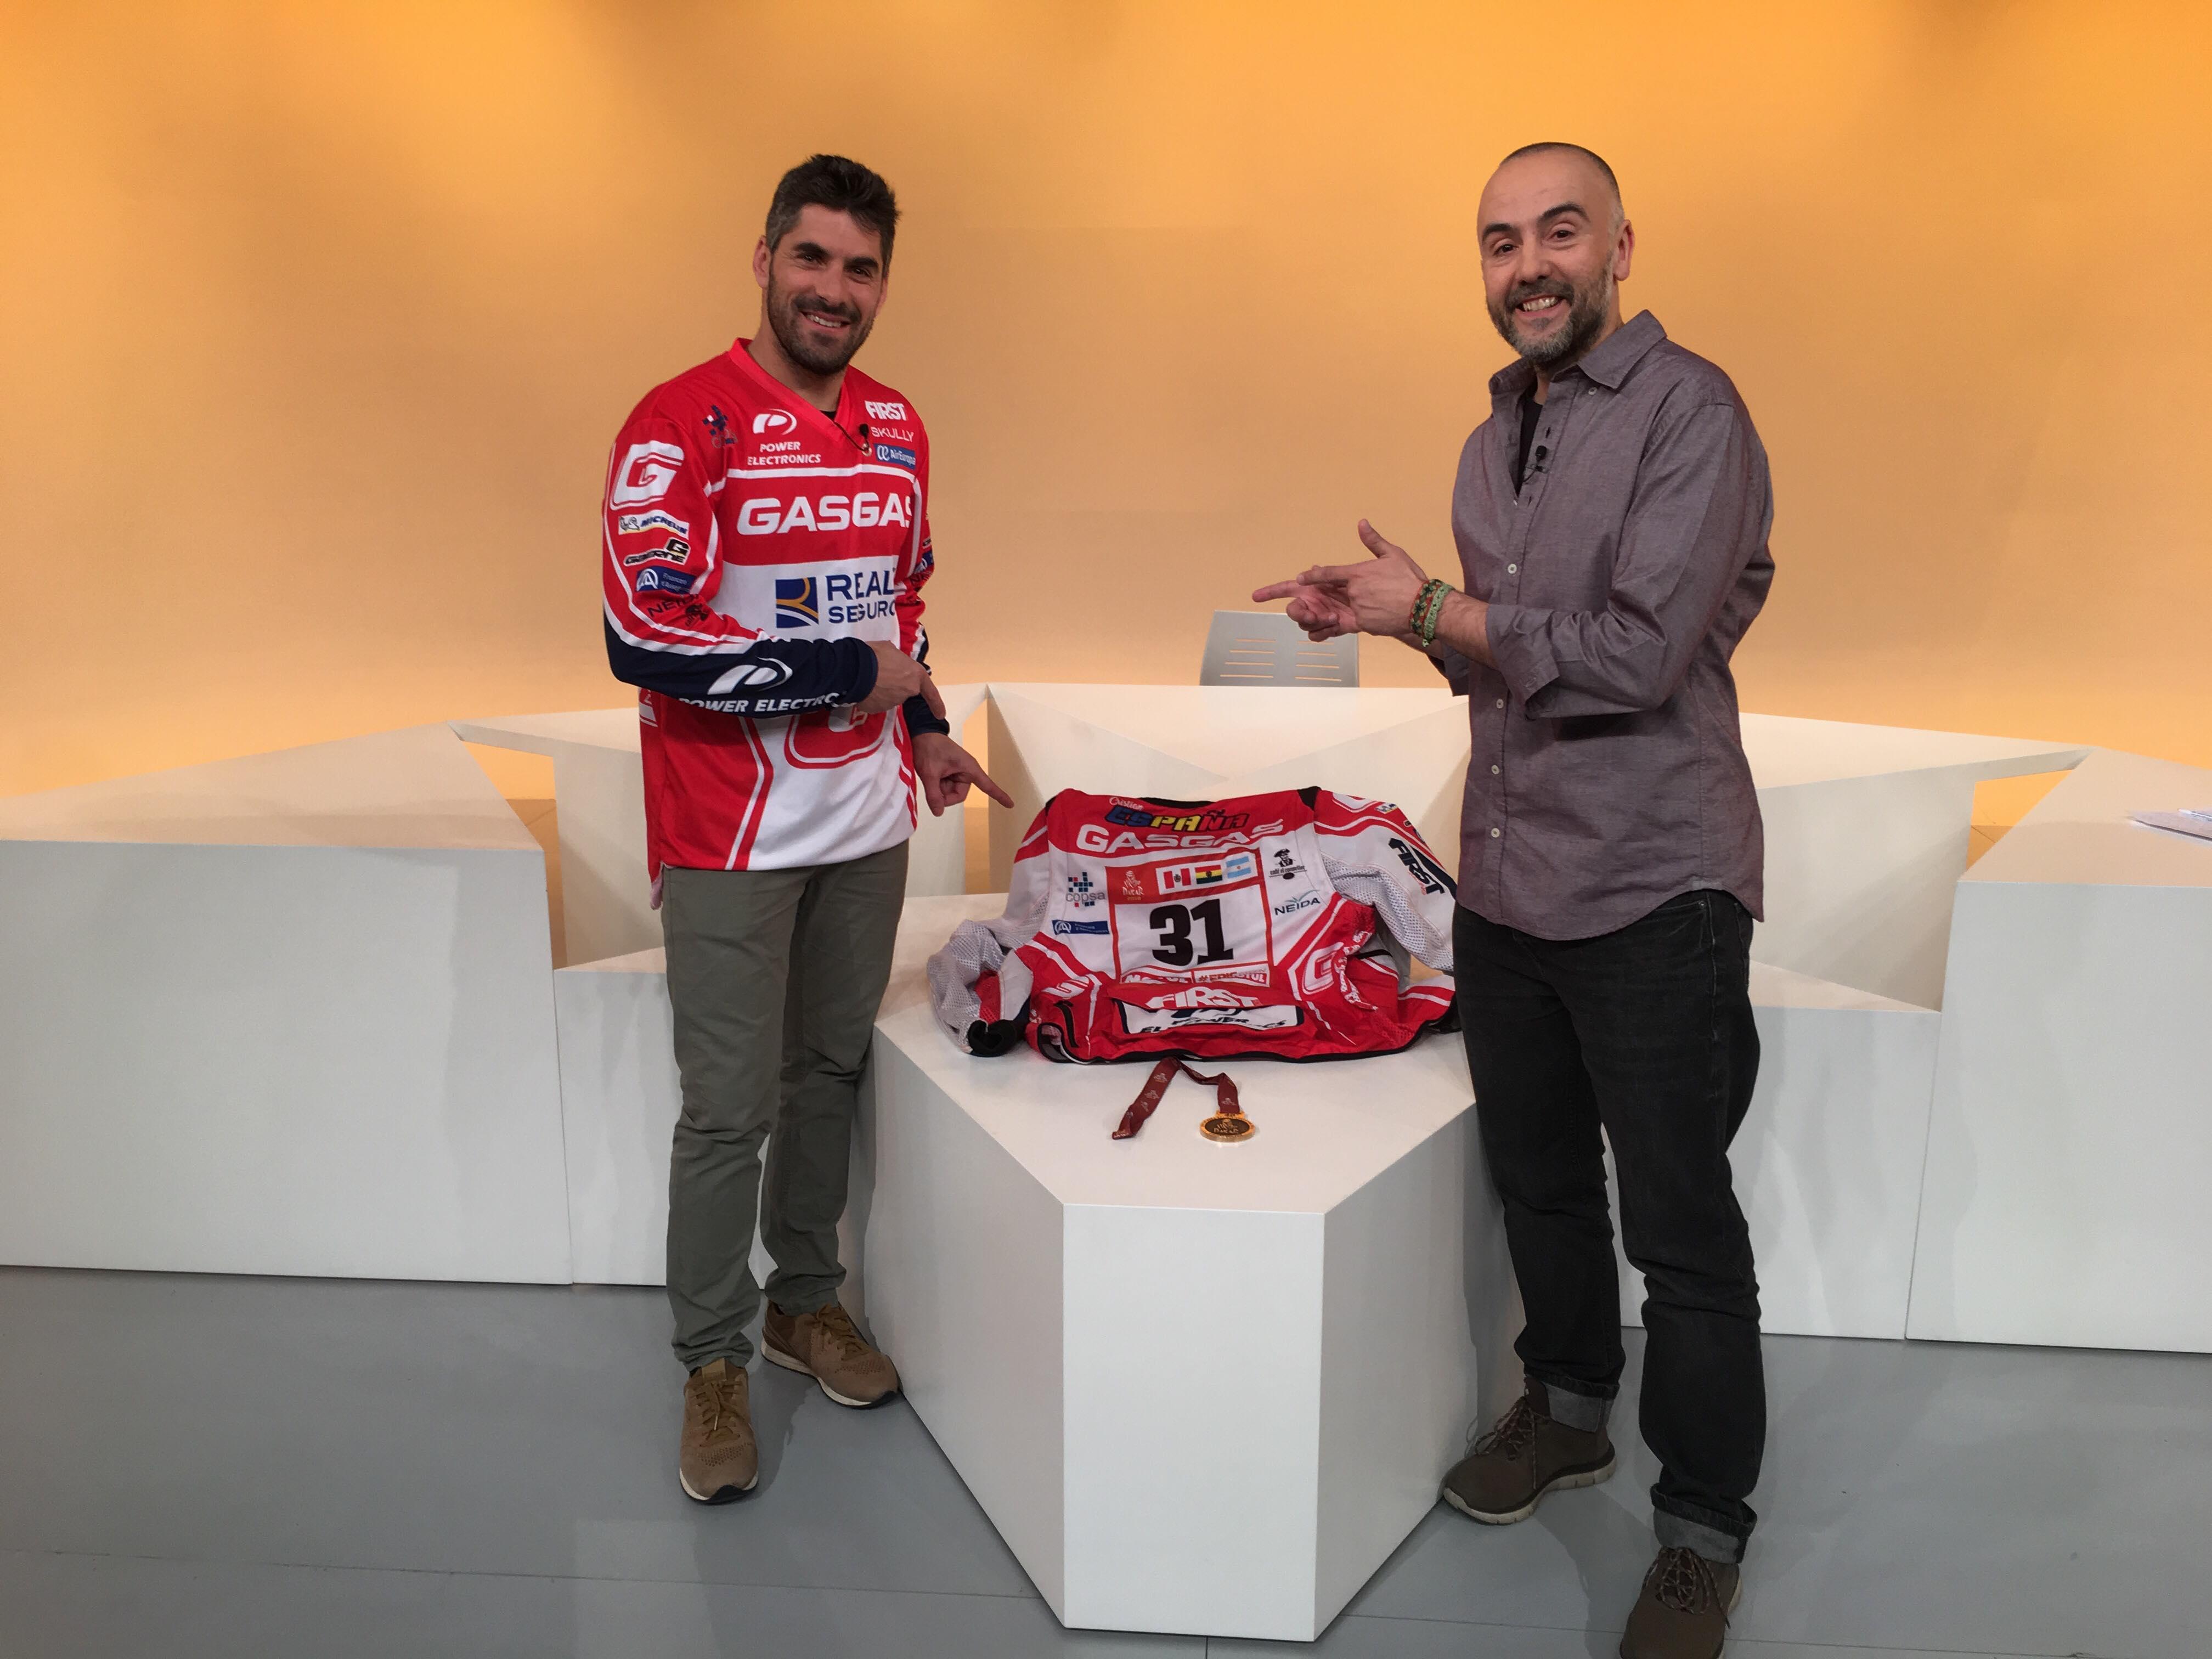 Dia E 2a part - L'experiència de Cristian España al Dakar 2018